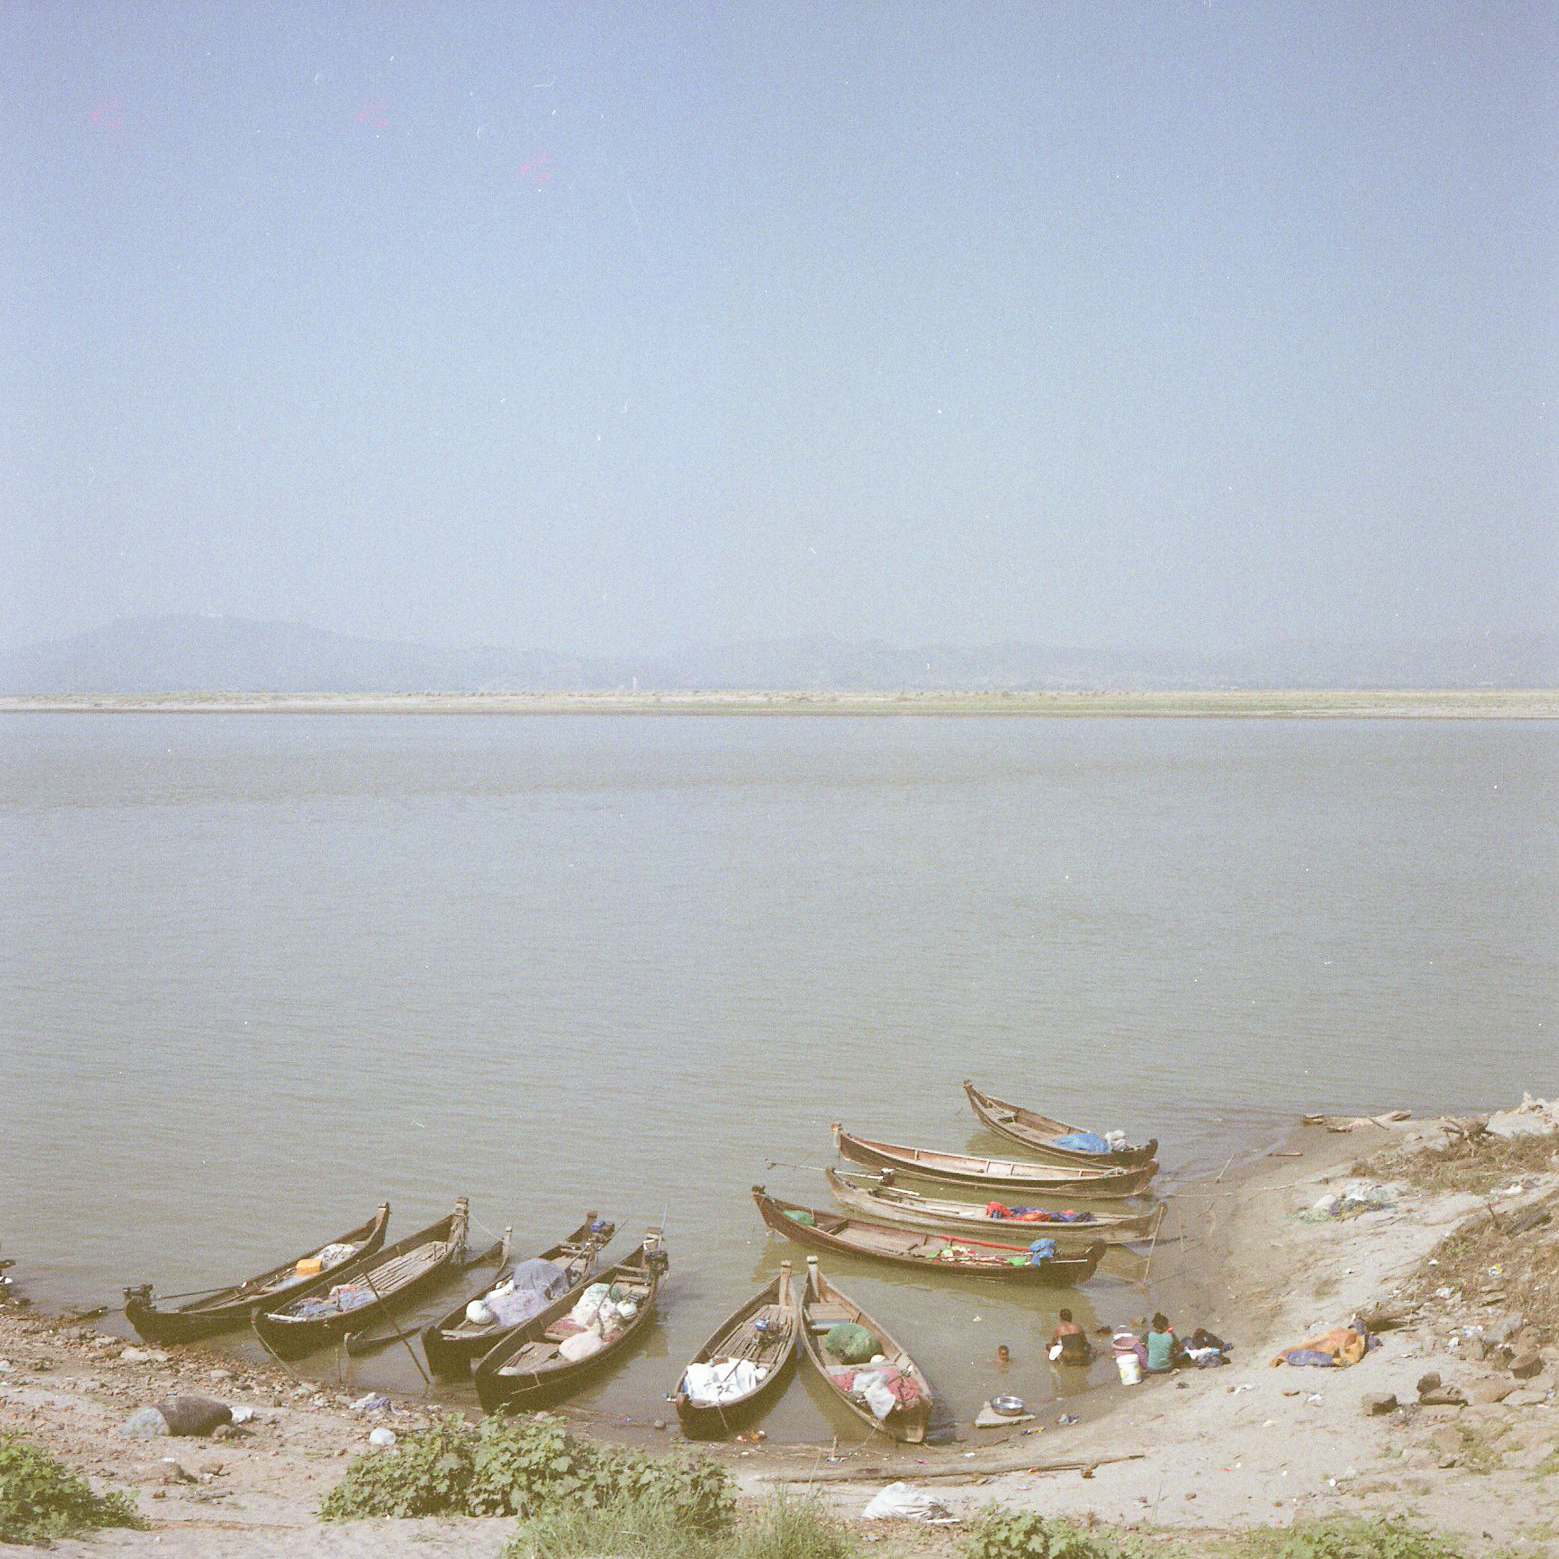 Myanmar-Irrawaddy_12